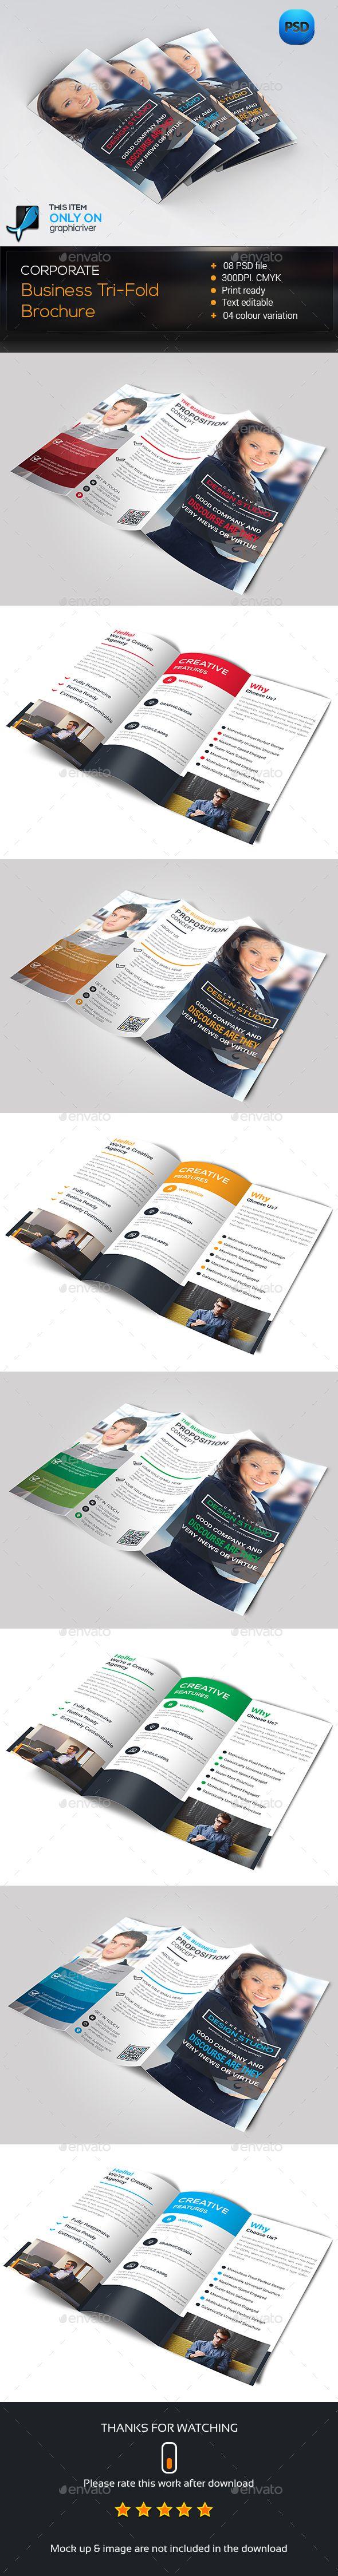 Trifold Brochure Template PSD #design Download: http://graphicriver.net/item/trifold-brochure/14237114?ref=ksioks